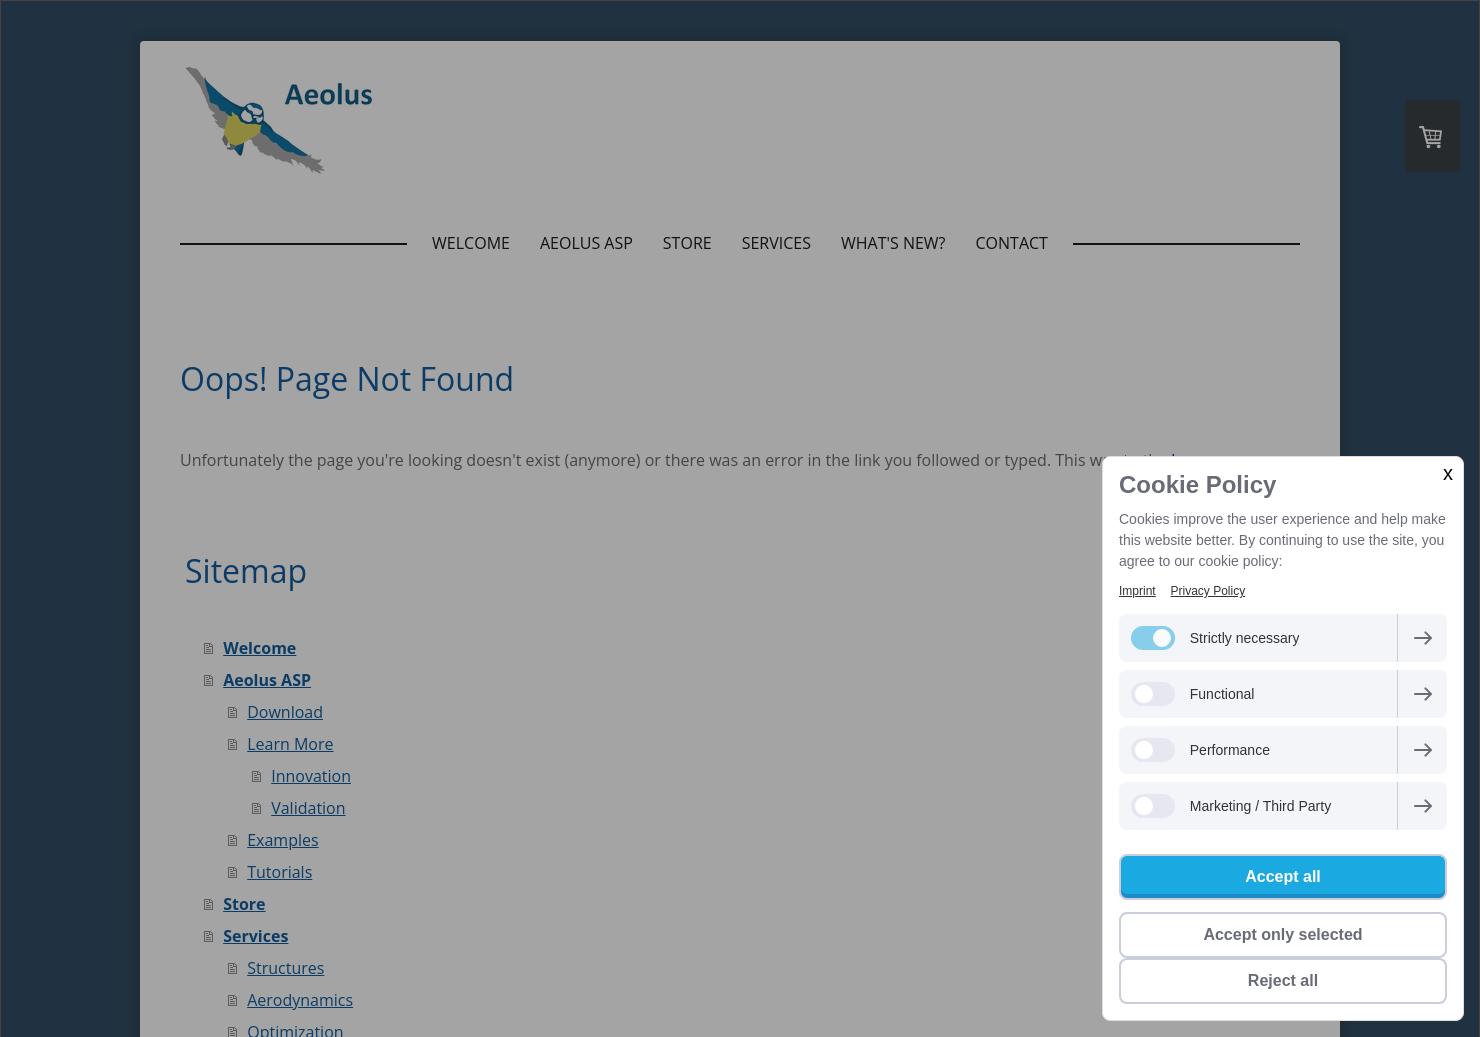 Free adddress autocomplete - Alexandracity